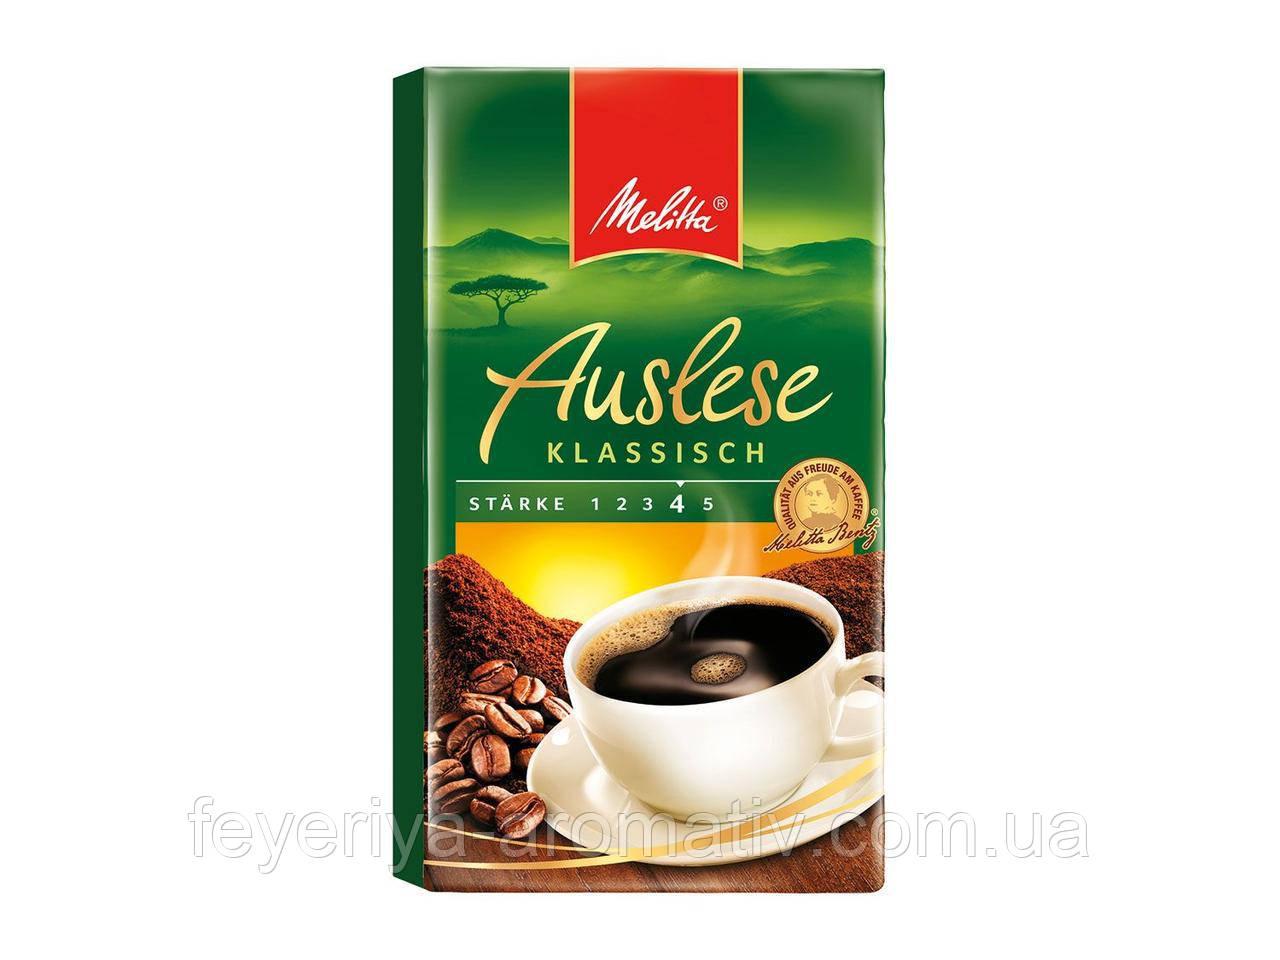 Кофе молотый Melitta Auslese Klassisch, 500гр (Германия)